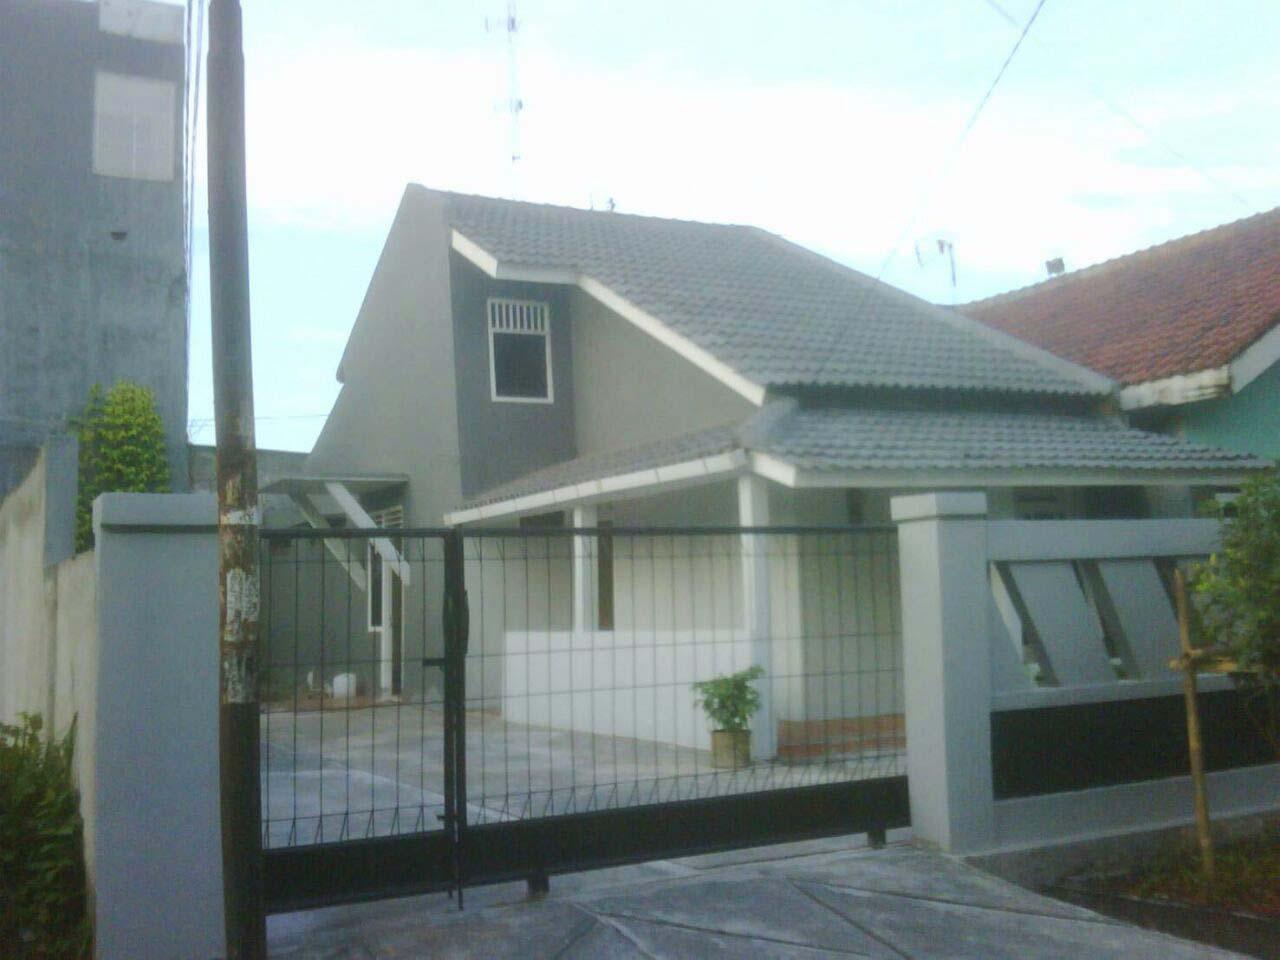 Rumah Dijual  lokasi strategis, bagus, nyaman dan aman daerah Karawang-Jabar